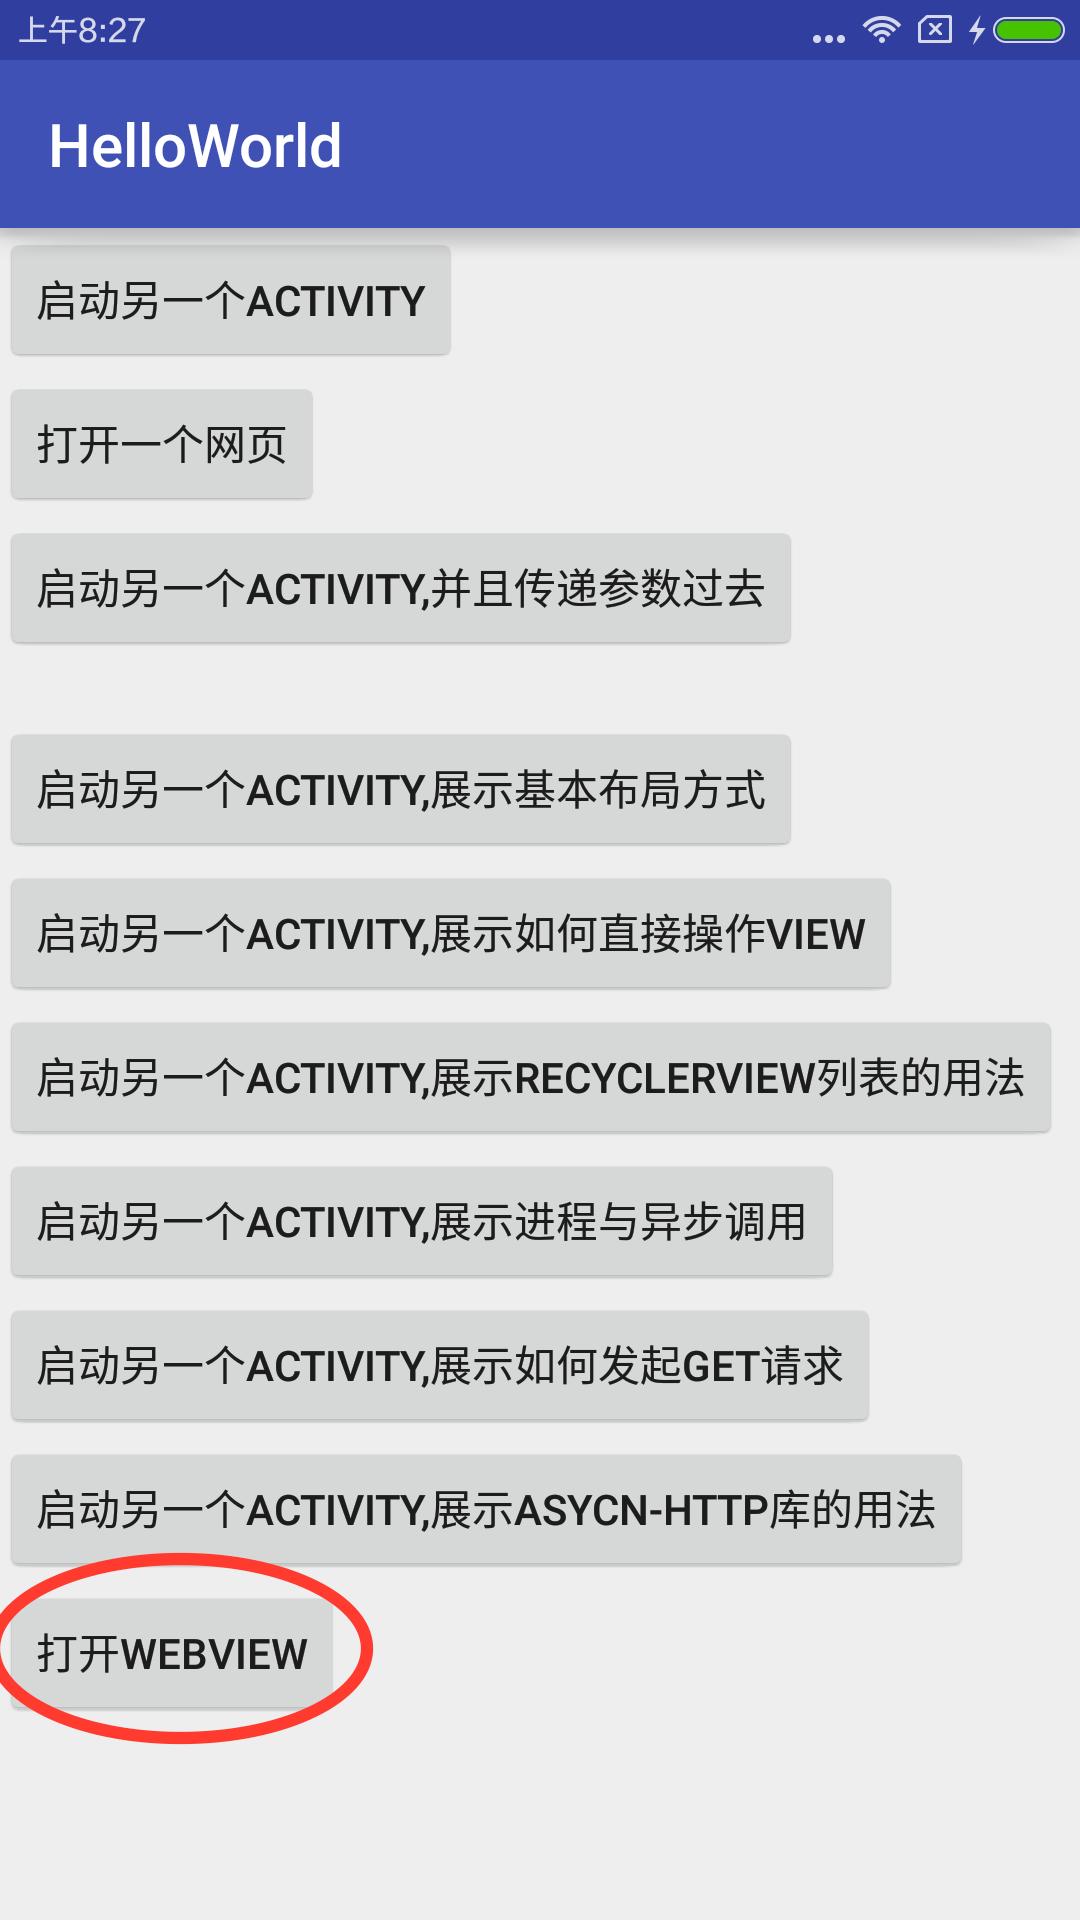 screenshot_2016-06-29-08-27-43_com example youngw